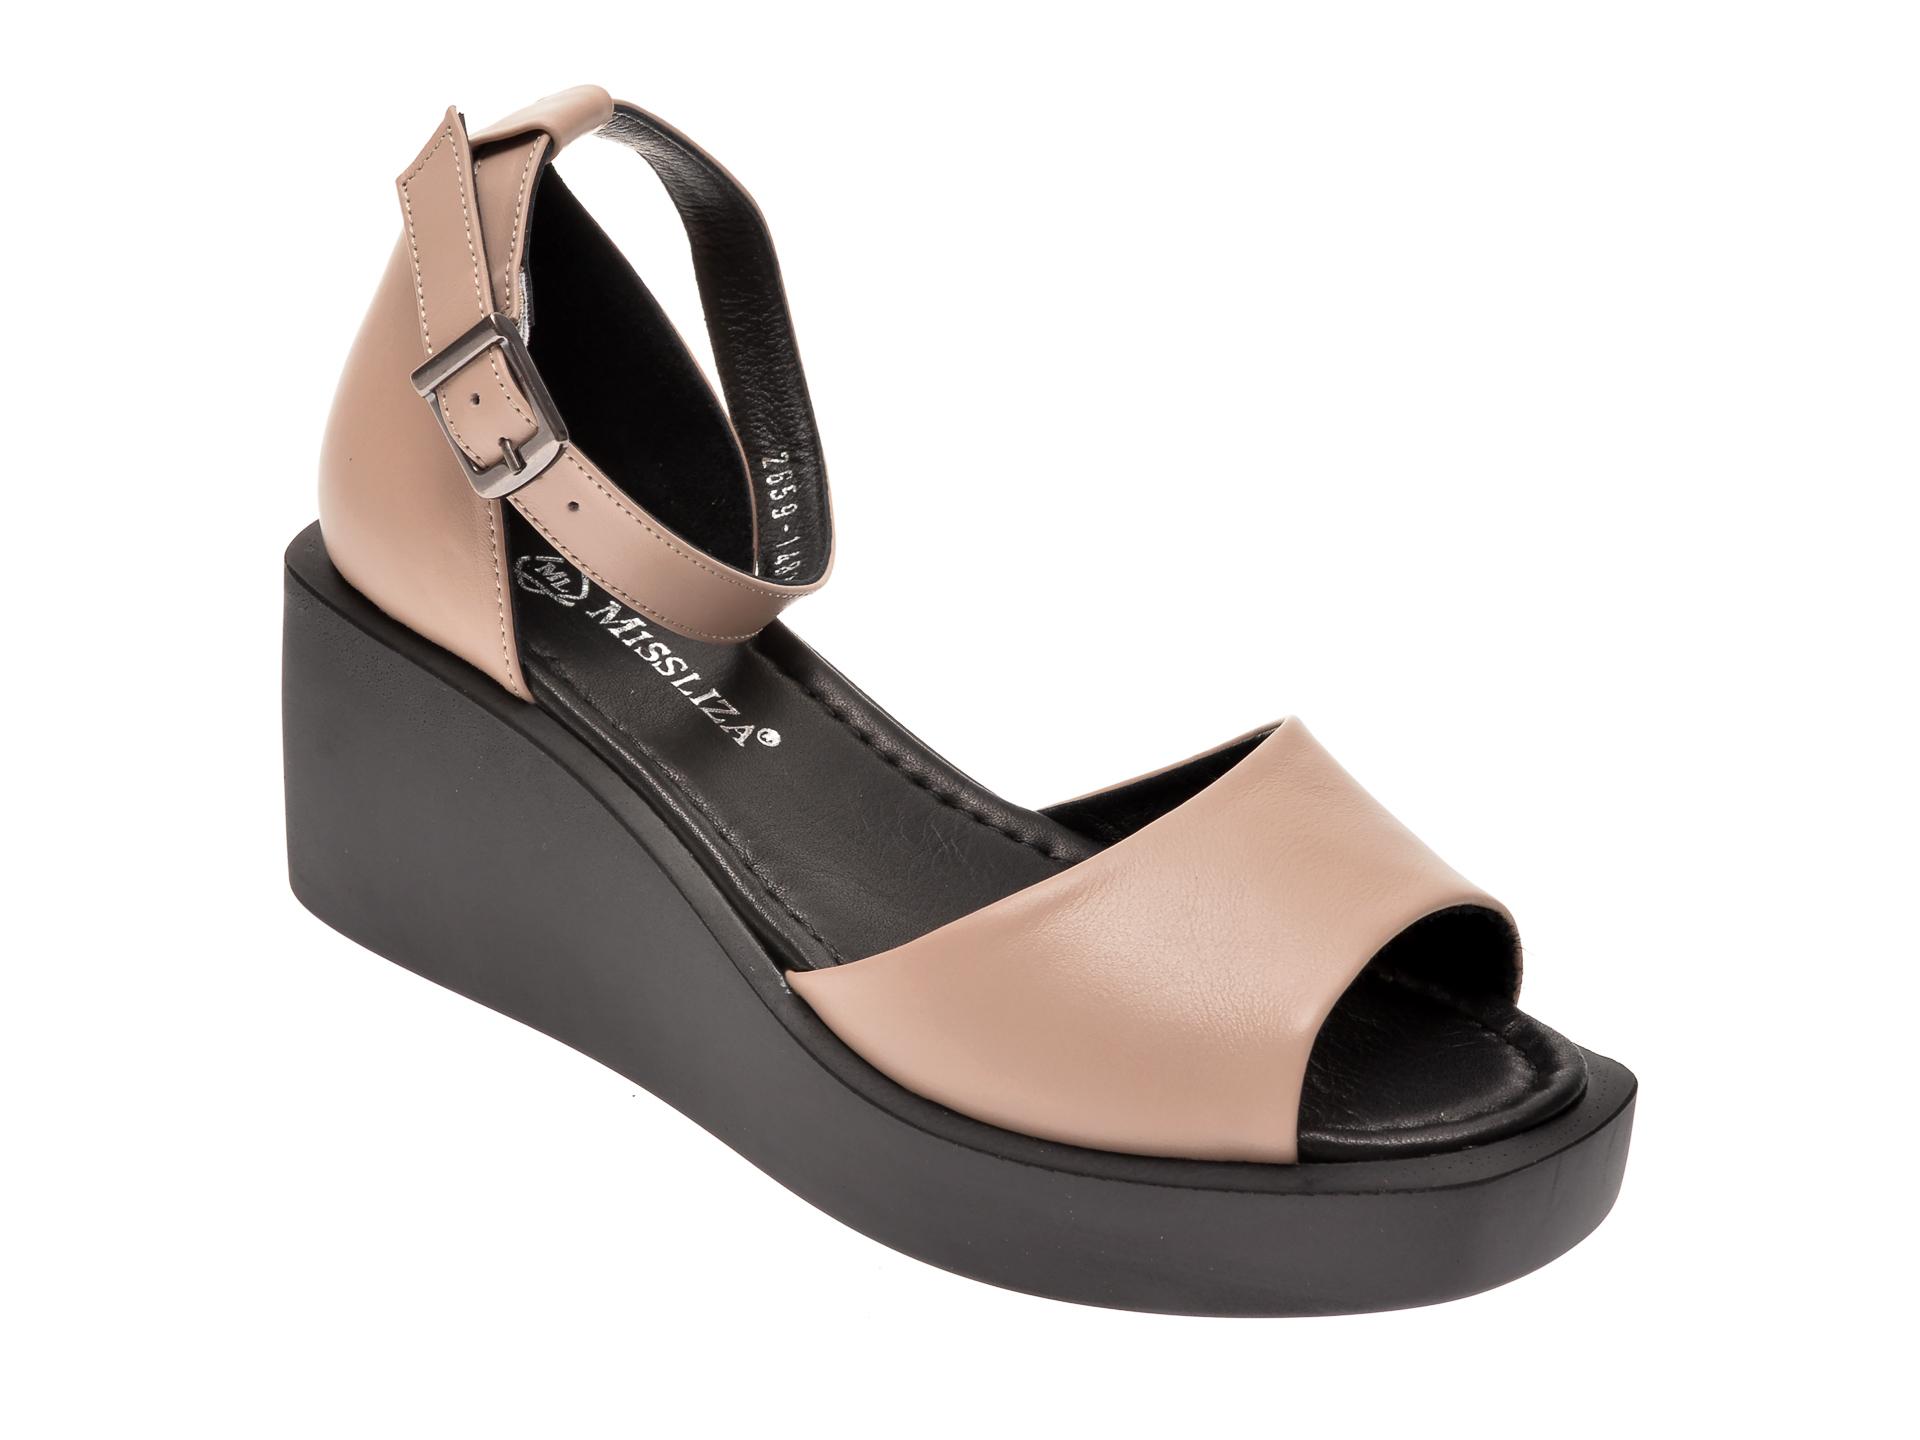 Sandale MISS LIZA gri, 1182659, din piele naturala